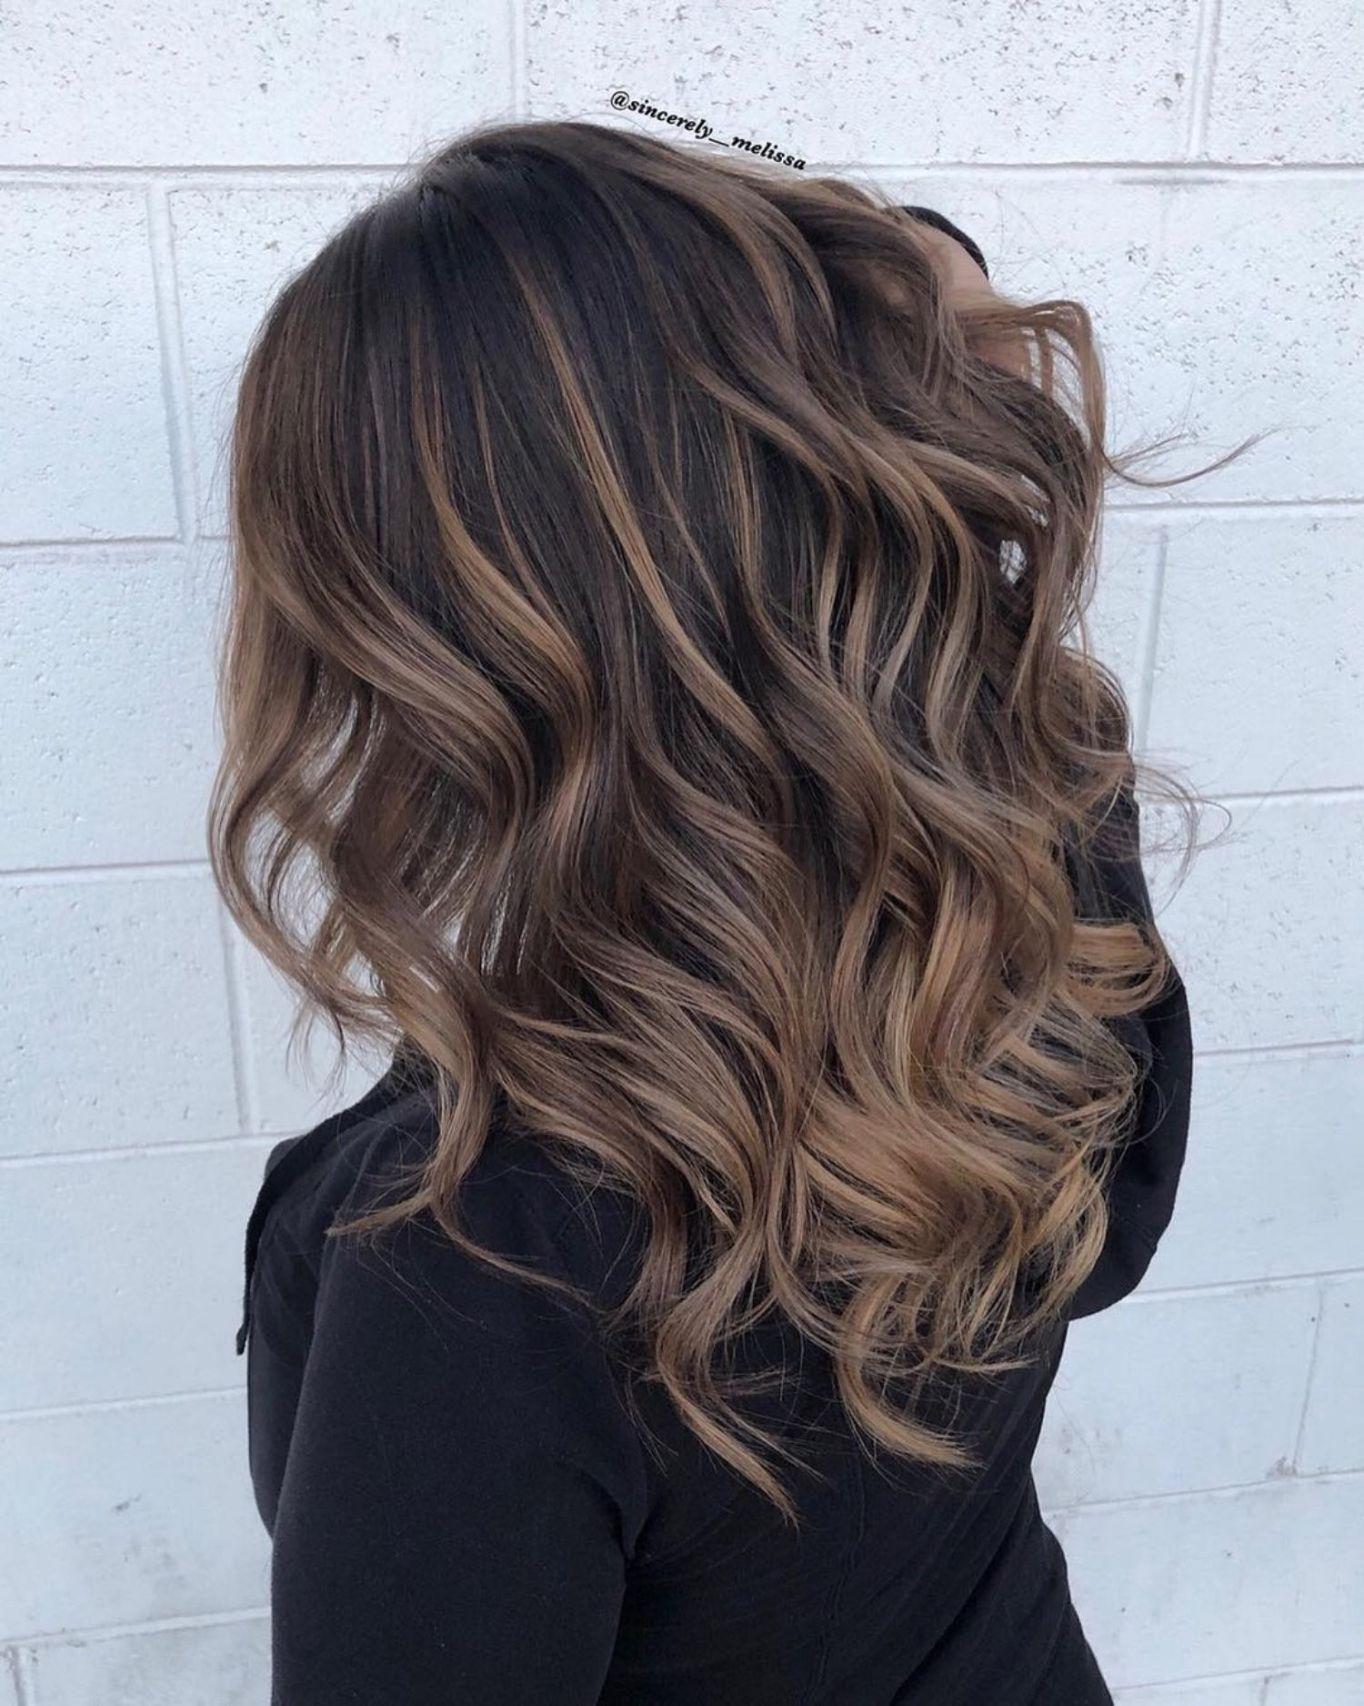 60 Hairstyles Featuring Dark Brown Hair With Highlights Hair Color For Black Hair Dark Hair With Highlights Hair Styles